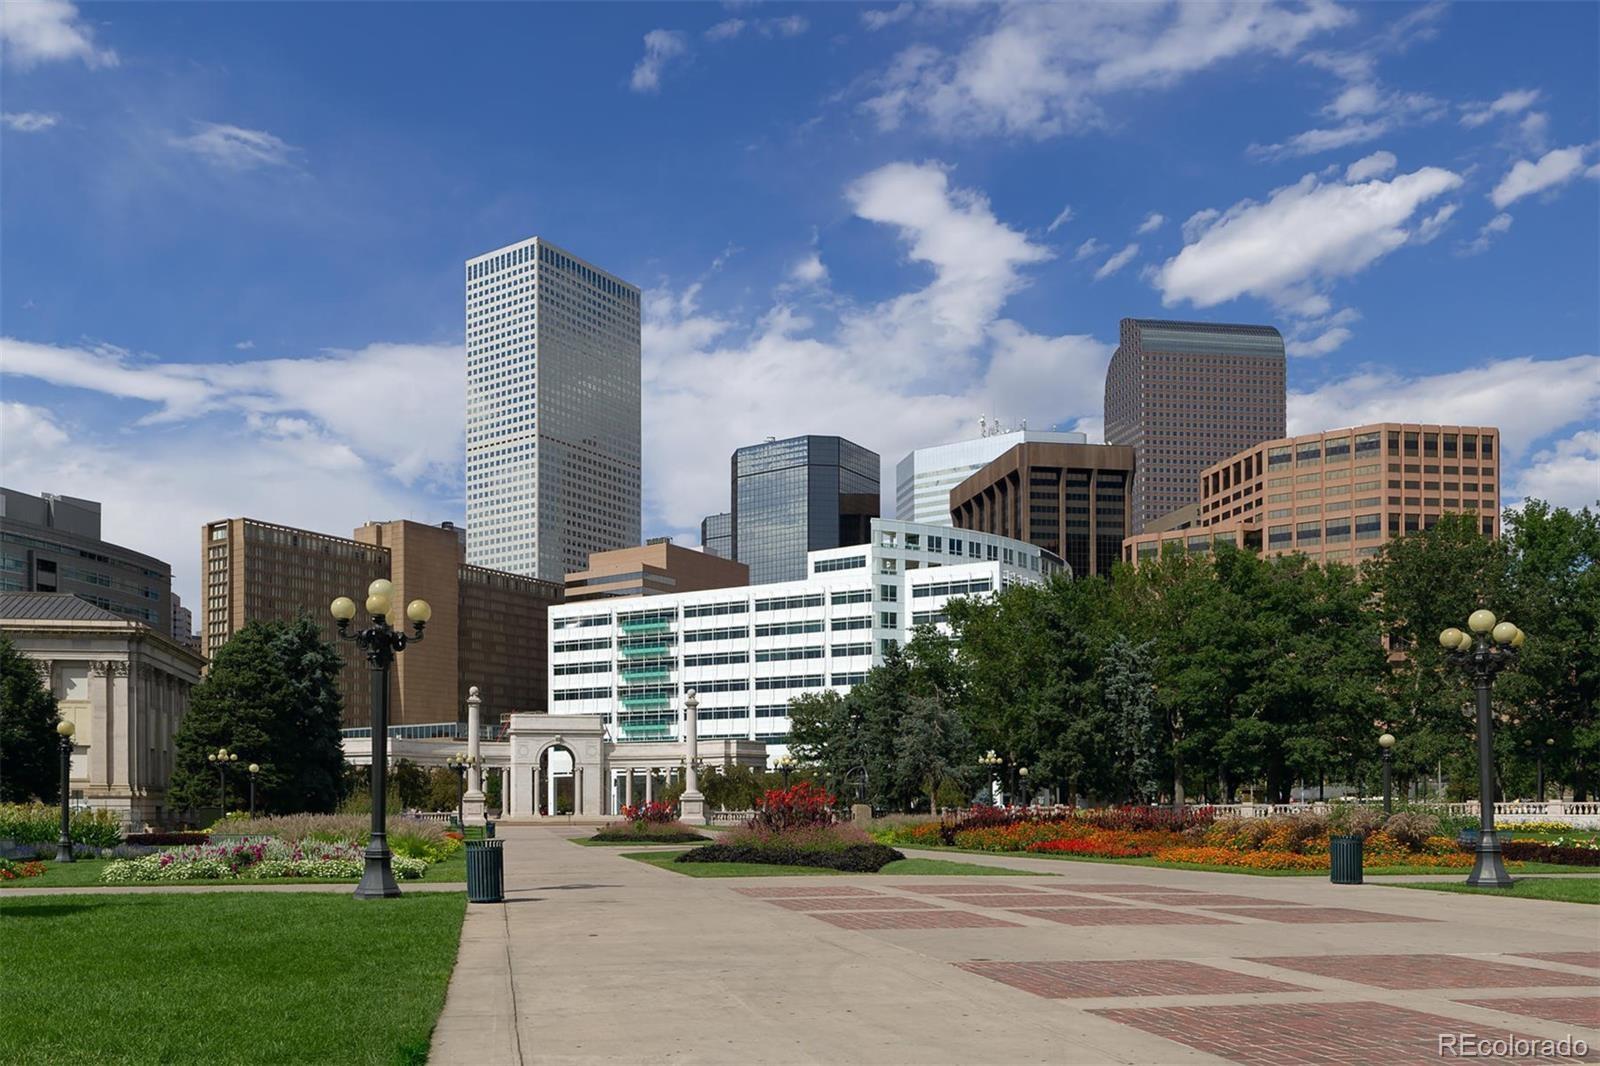 MLS# 3104729 - 1 - 80  W 10th Avenue, Denver, CO 80204